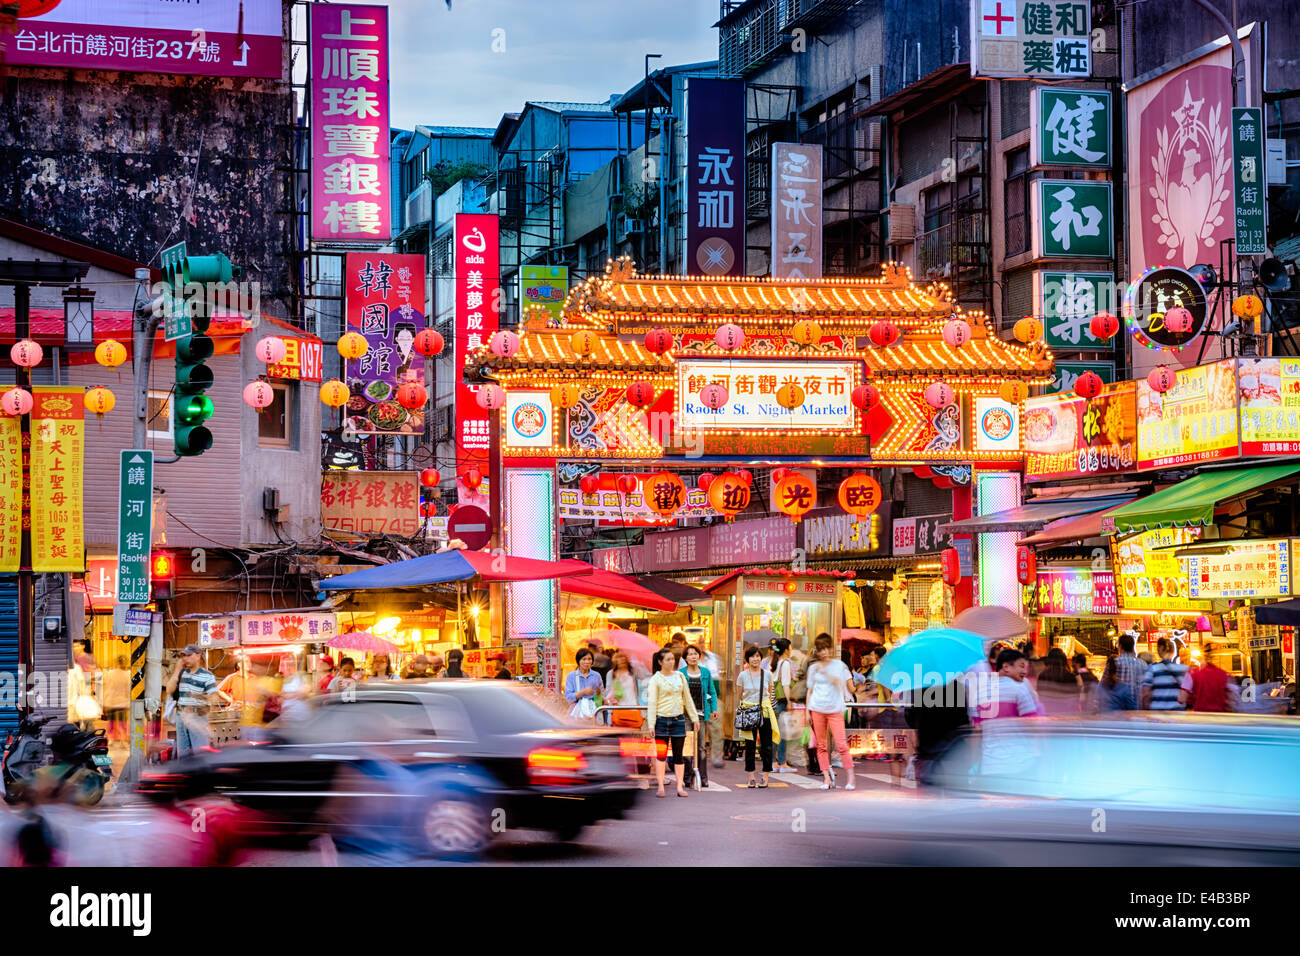 entrance-of-raohe-street-night-market-in